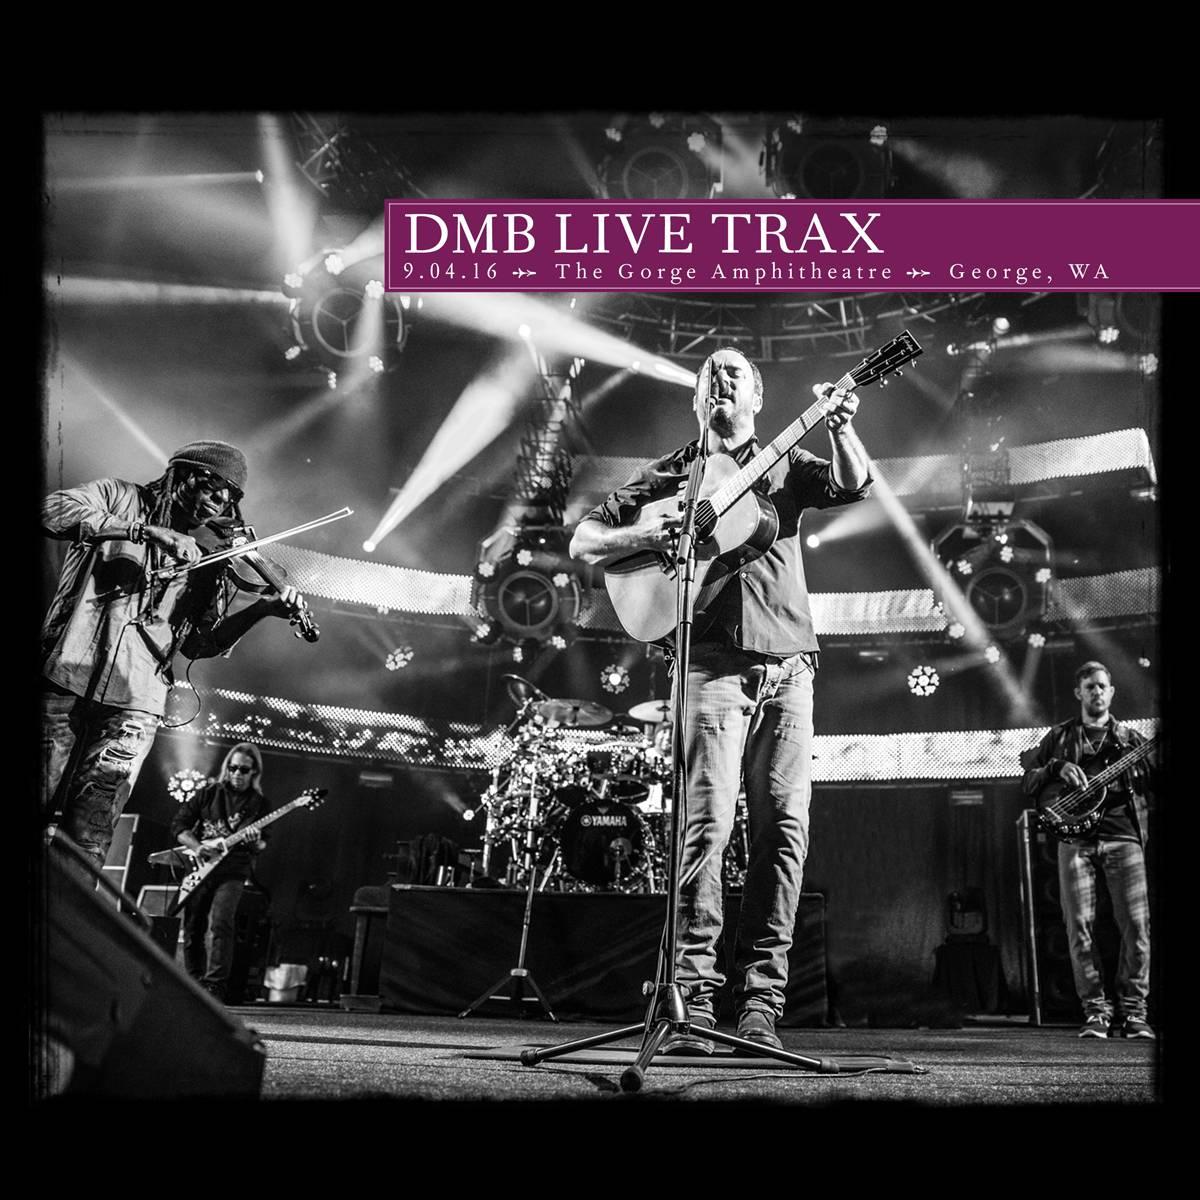 Dave Matthews Band - Live Trax Vol. 44: 2016-09-04 - The Gorge Amphitheatre - George, WA (2017) {4CD}